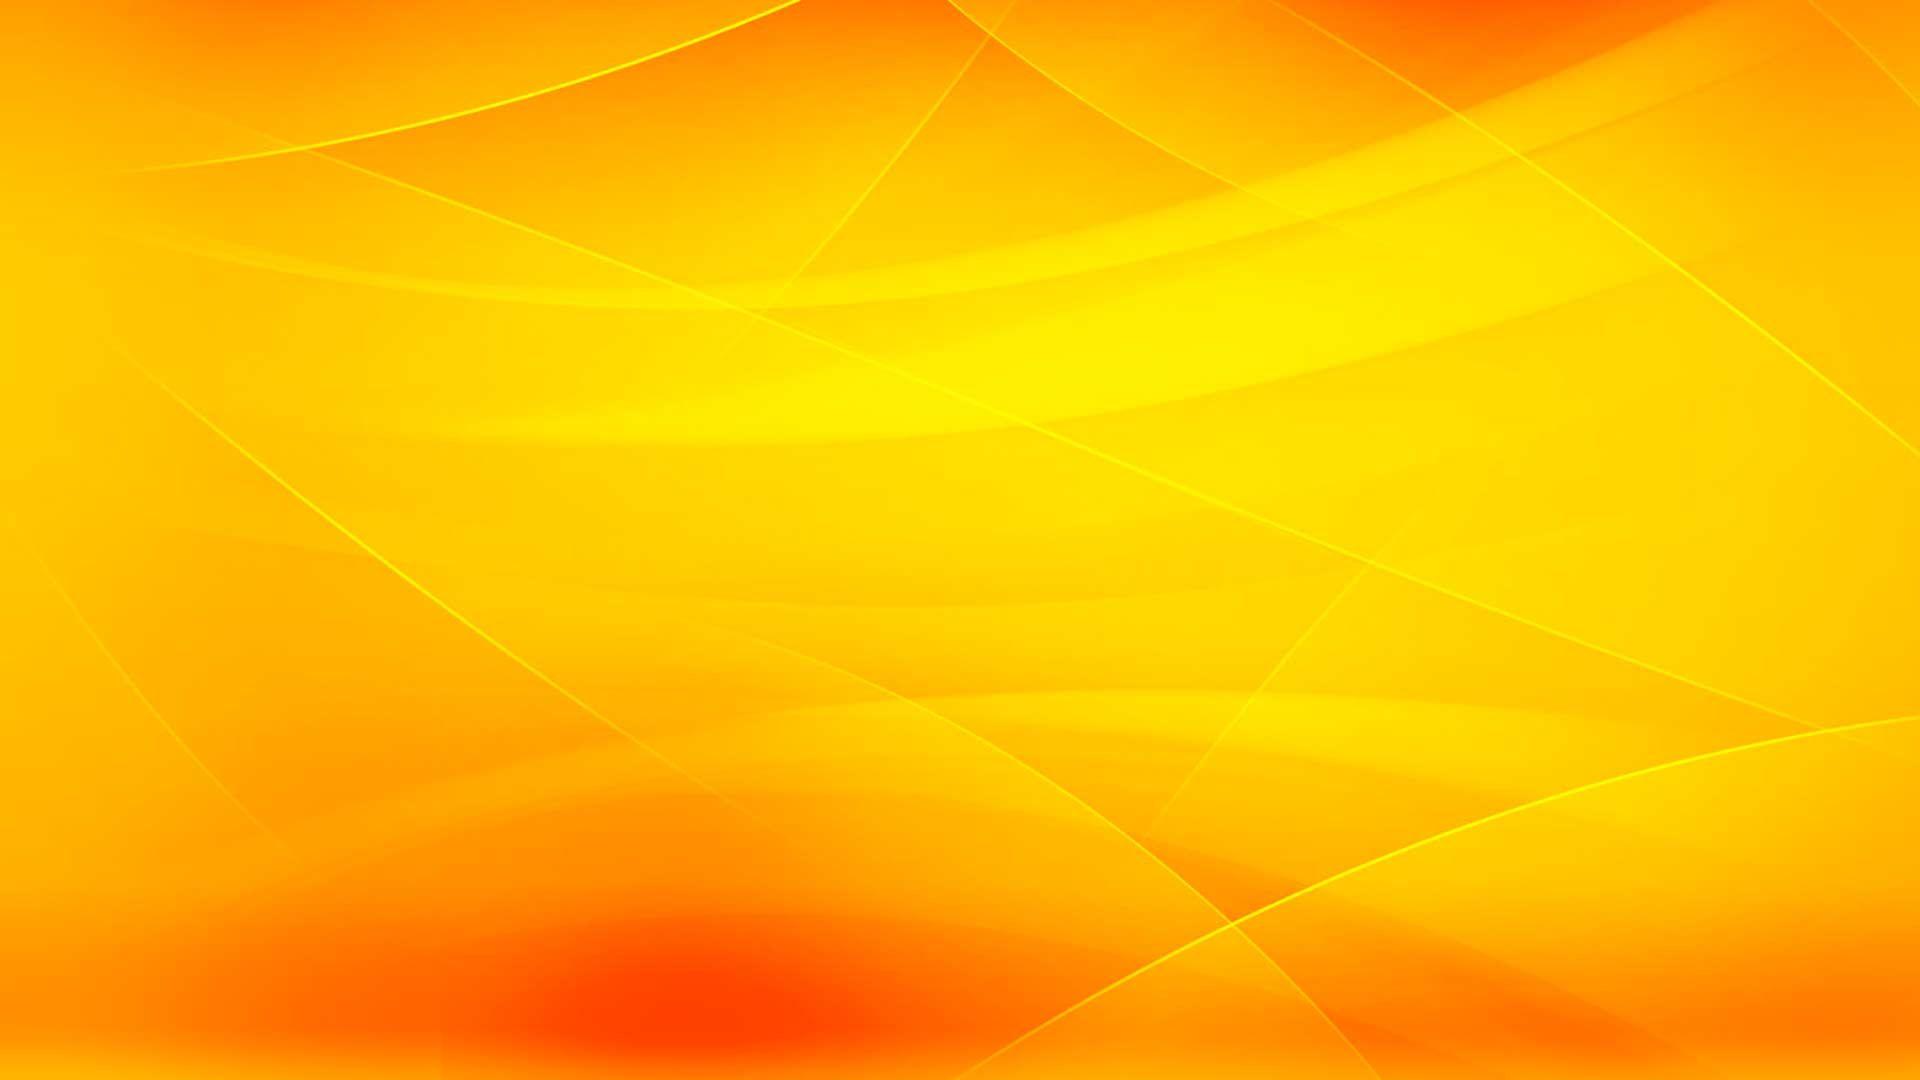 Orange wallpaper image hd